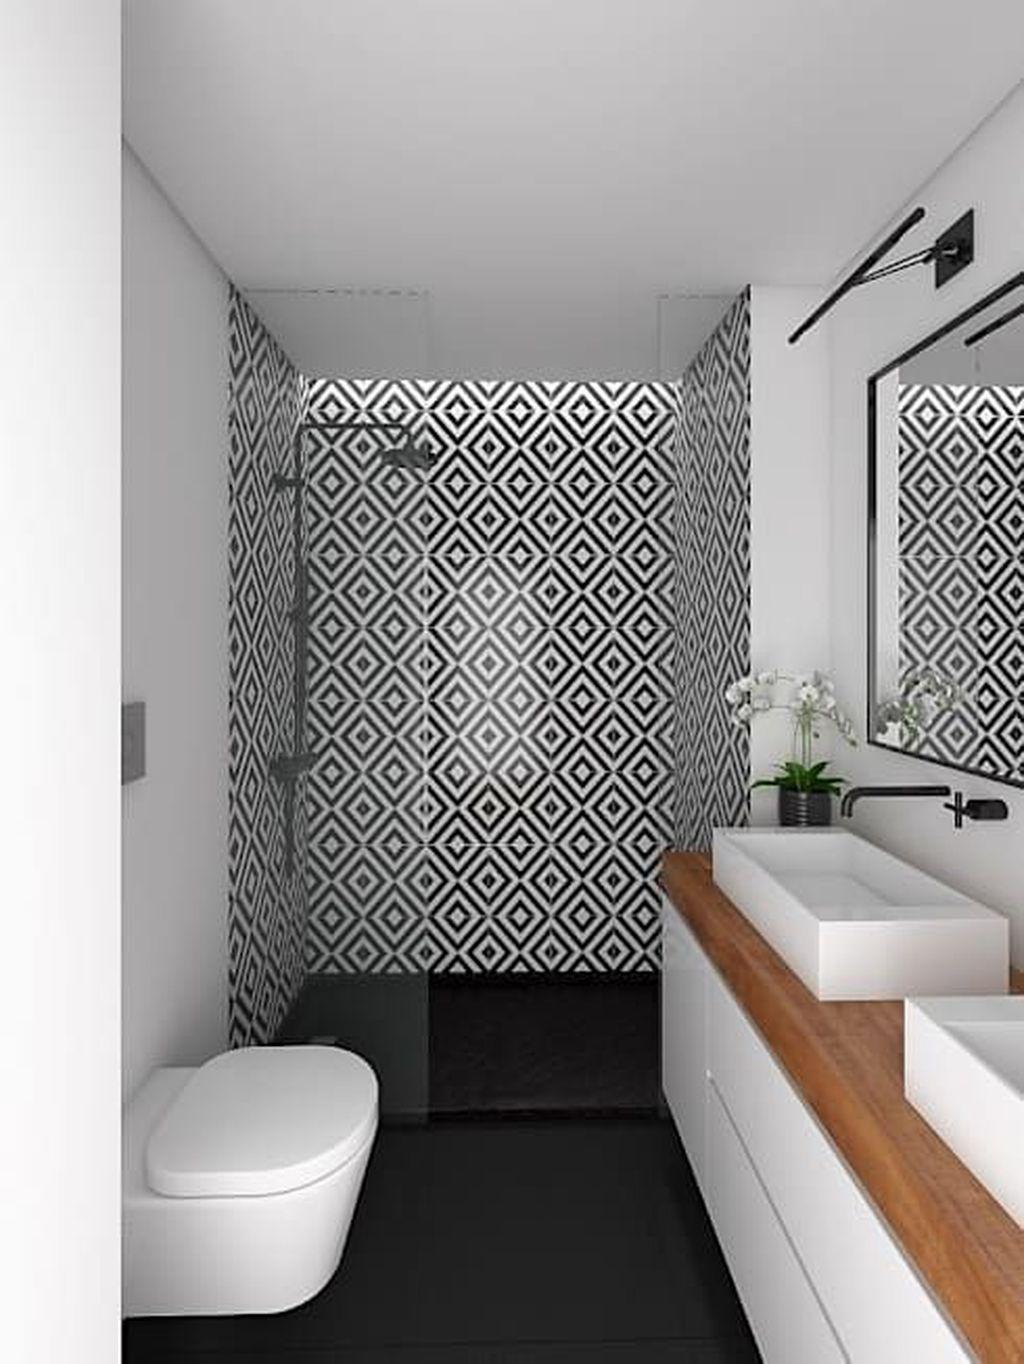 Enchanting Sink Design Ideas That Inspiring In This Year 08